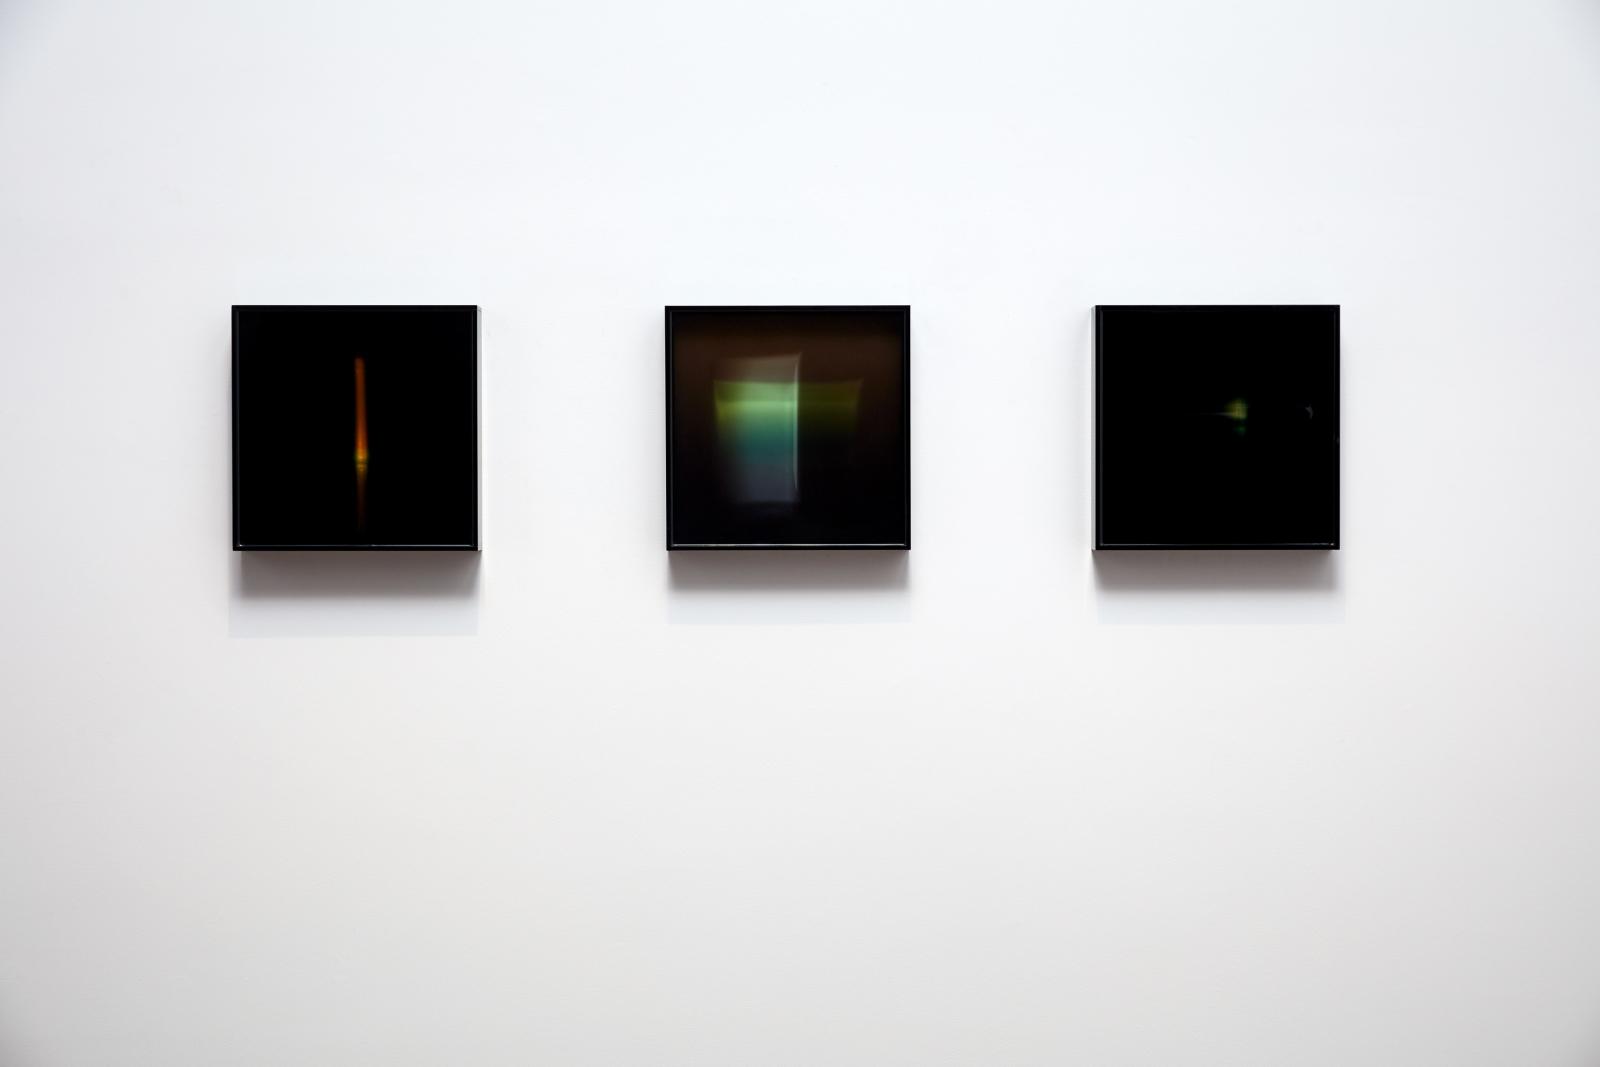 Helen Pashgian, Installation view, Lehmann Maupin, Seoul, 2019–2020